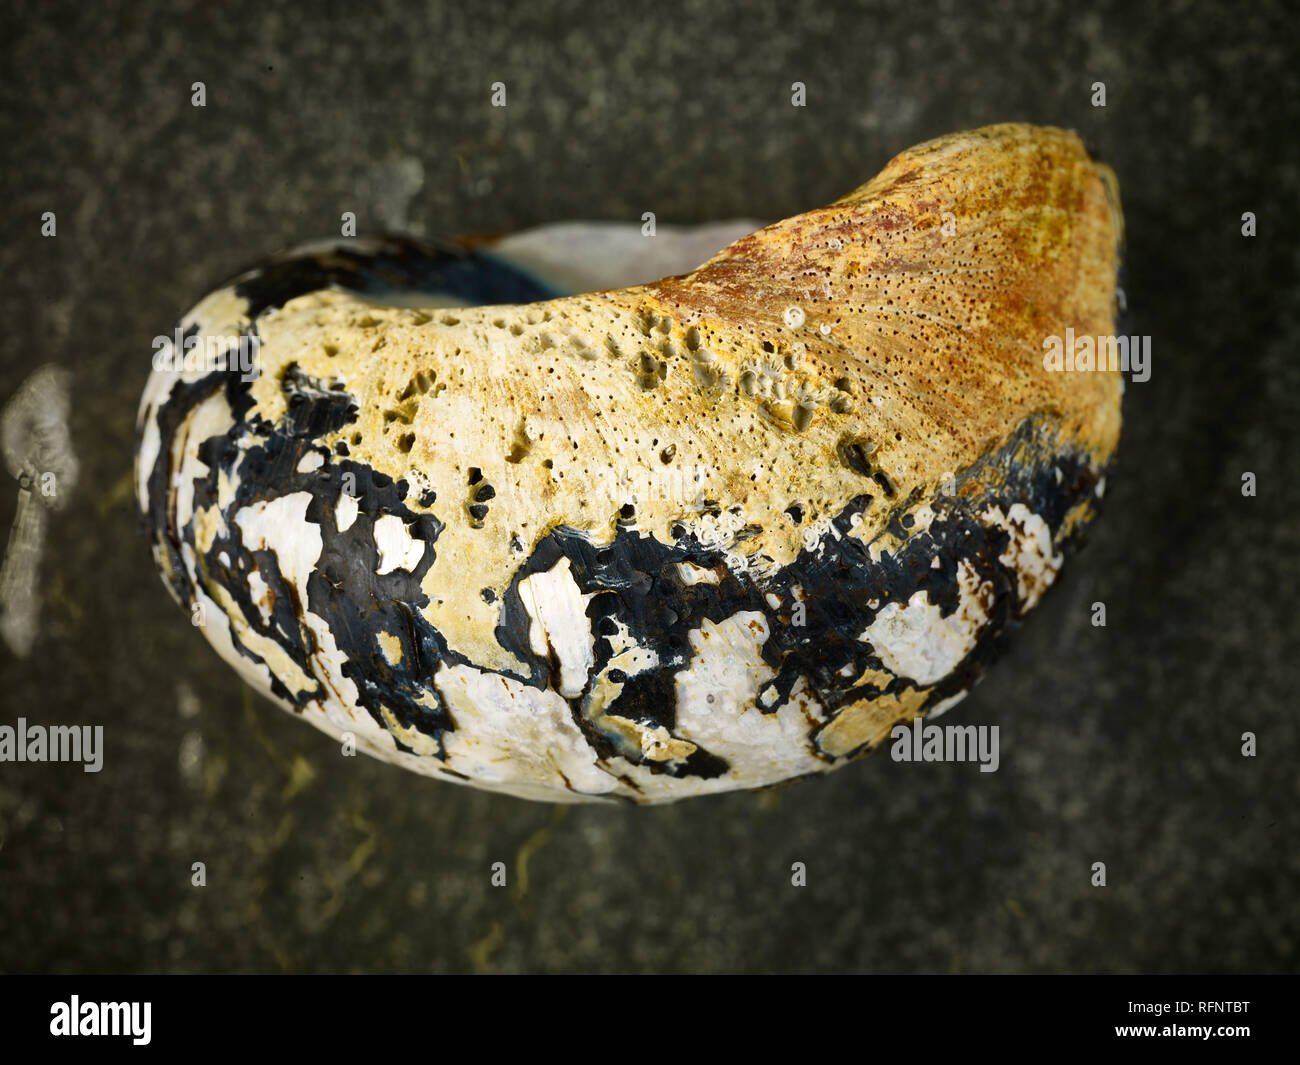 Colourful seashell still-life against dark background - Stock Image